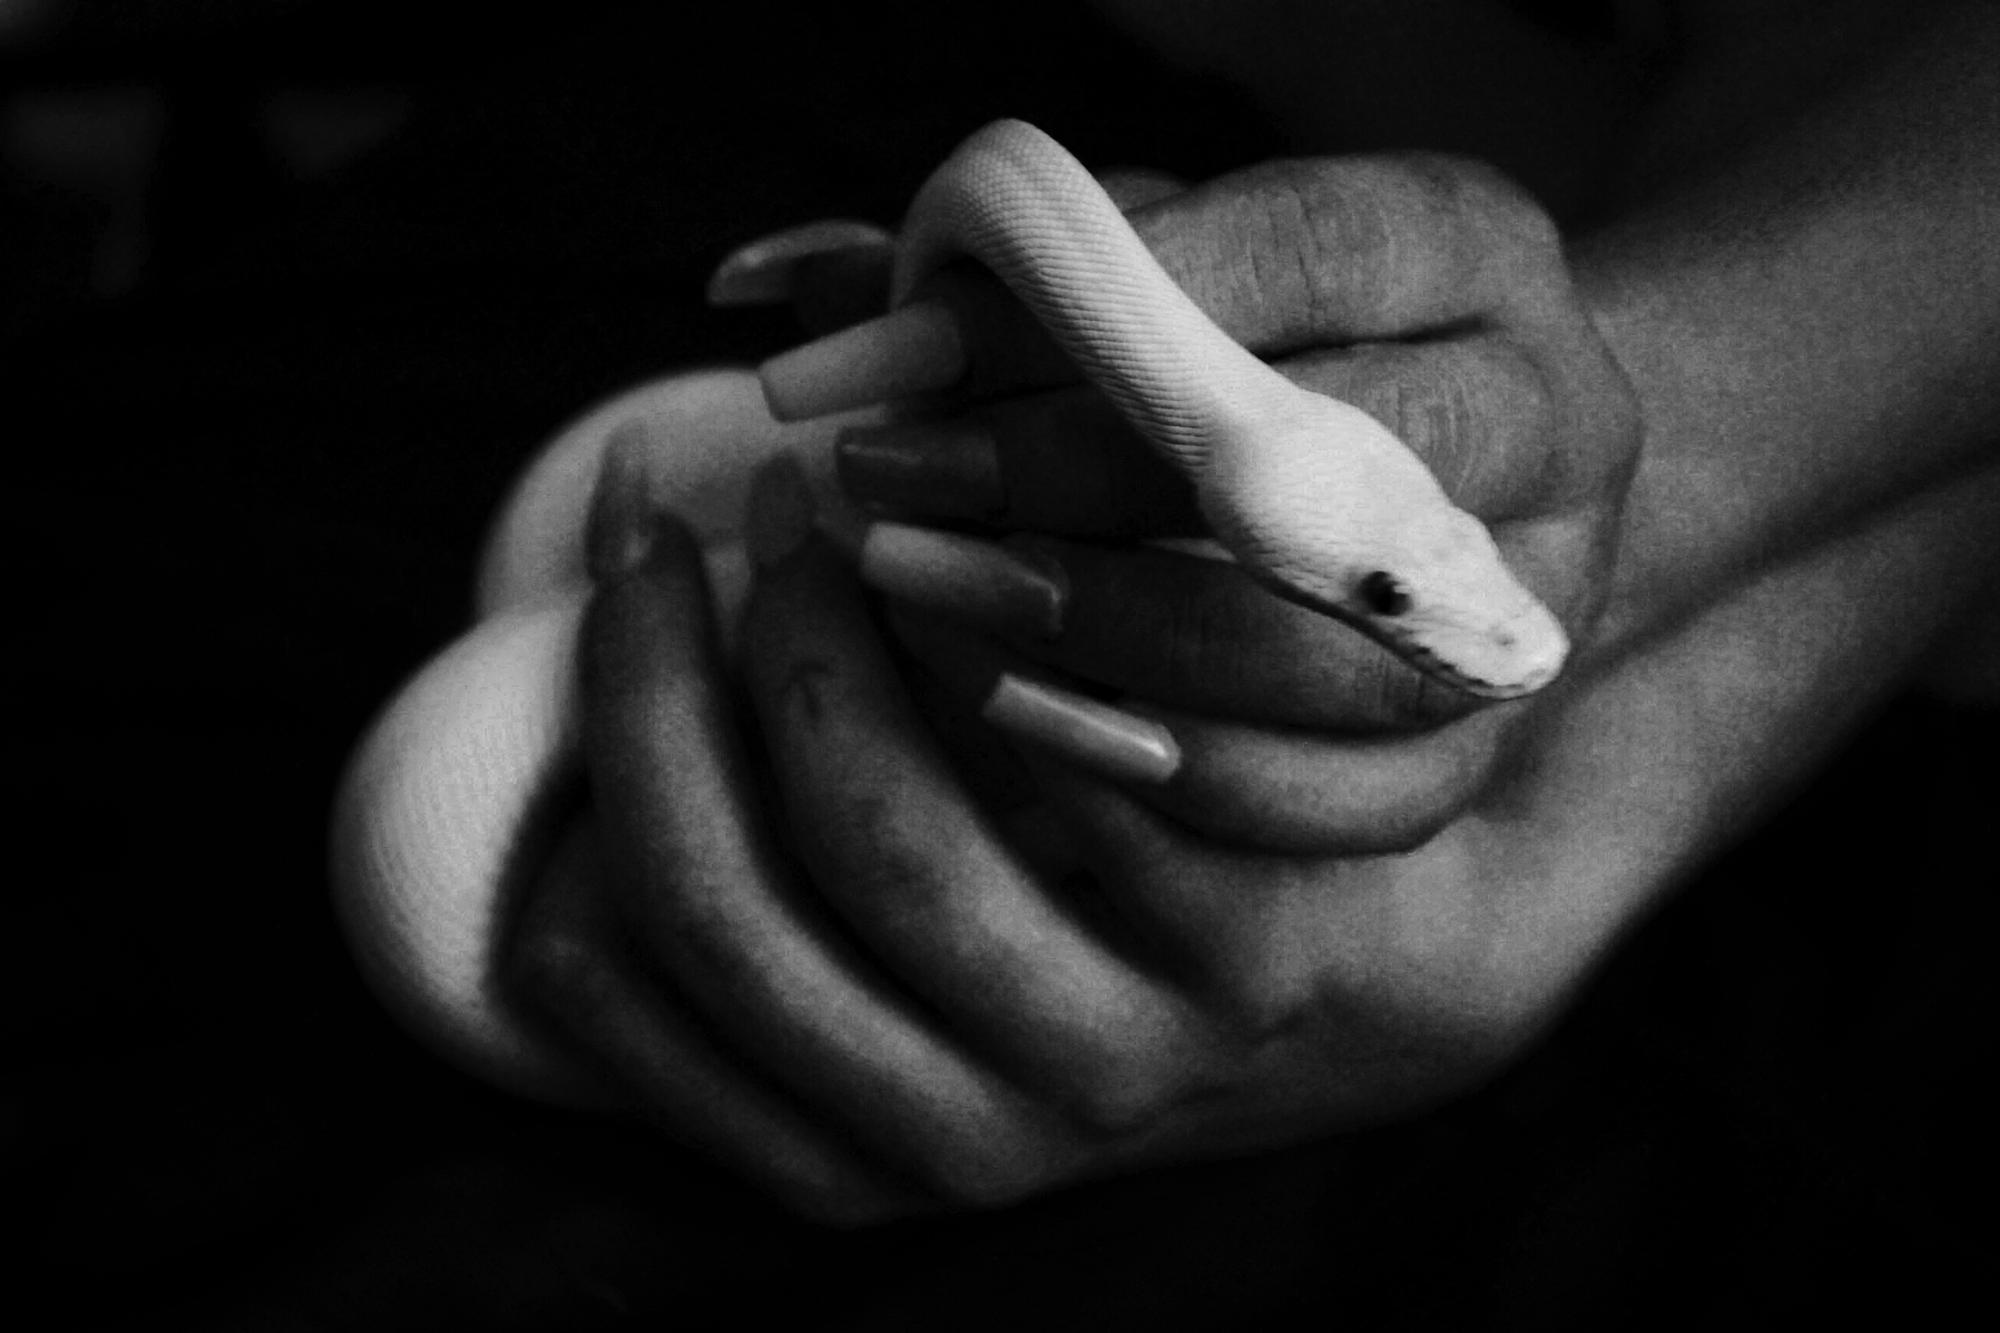 Turtle Bugg & Kelsey's snake,  White Boy Rick